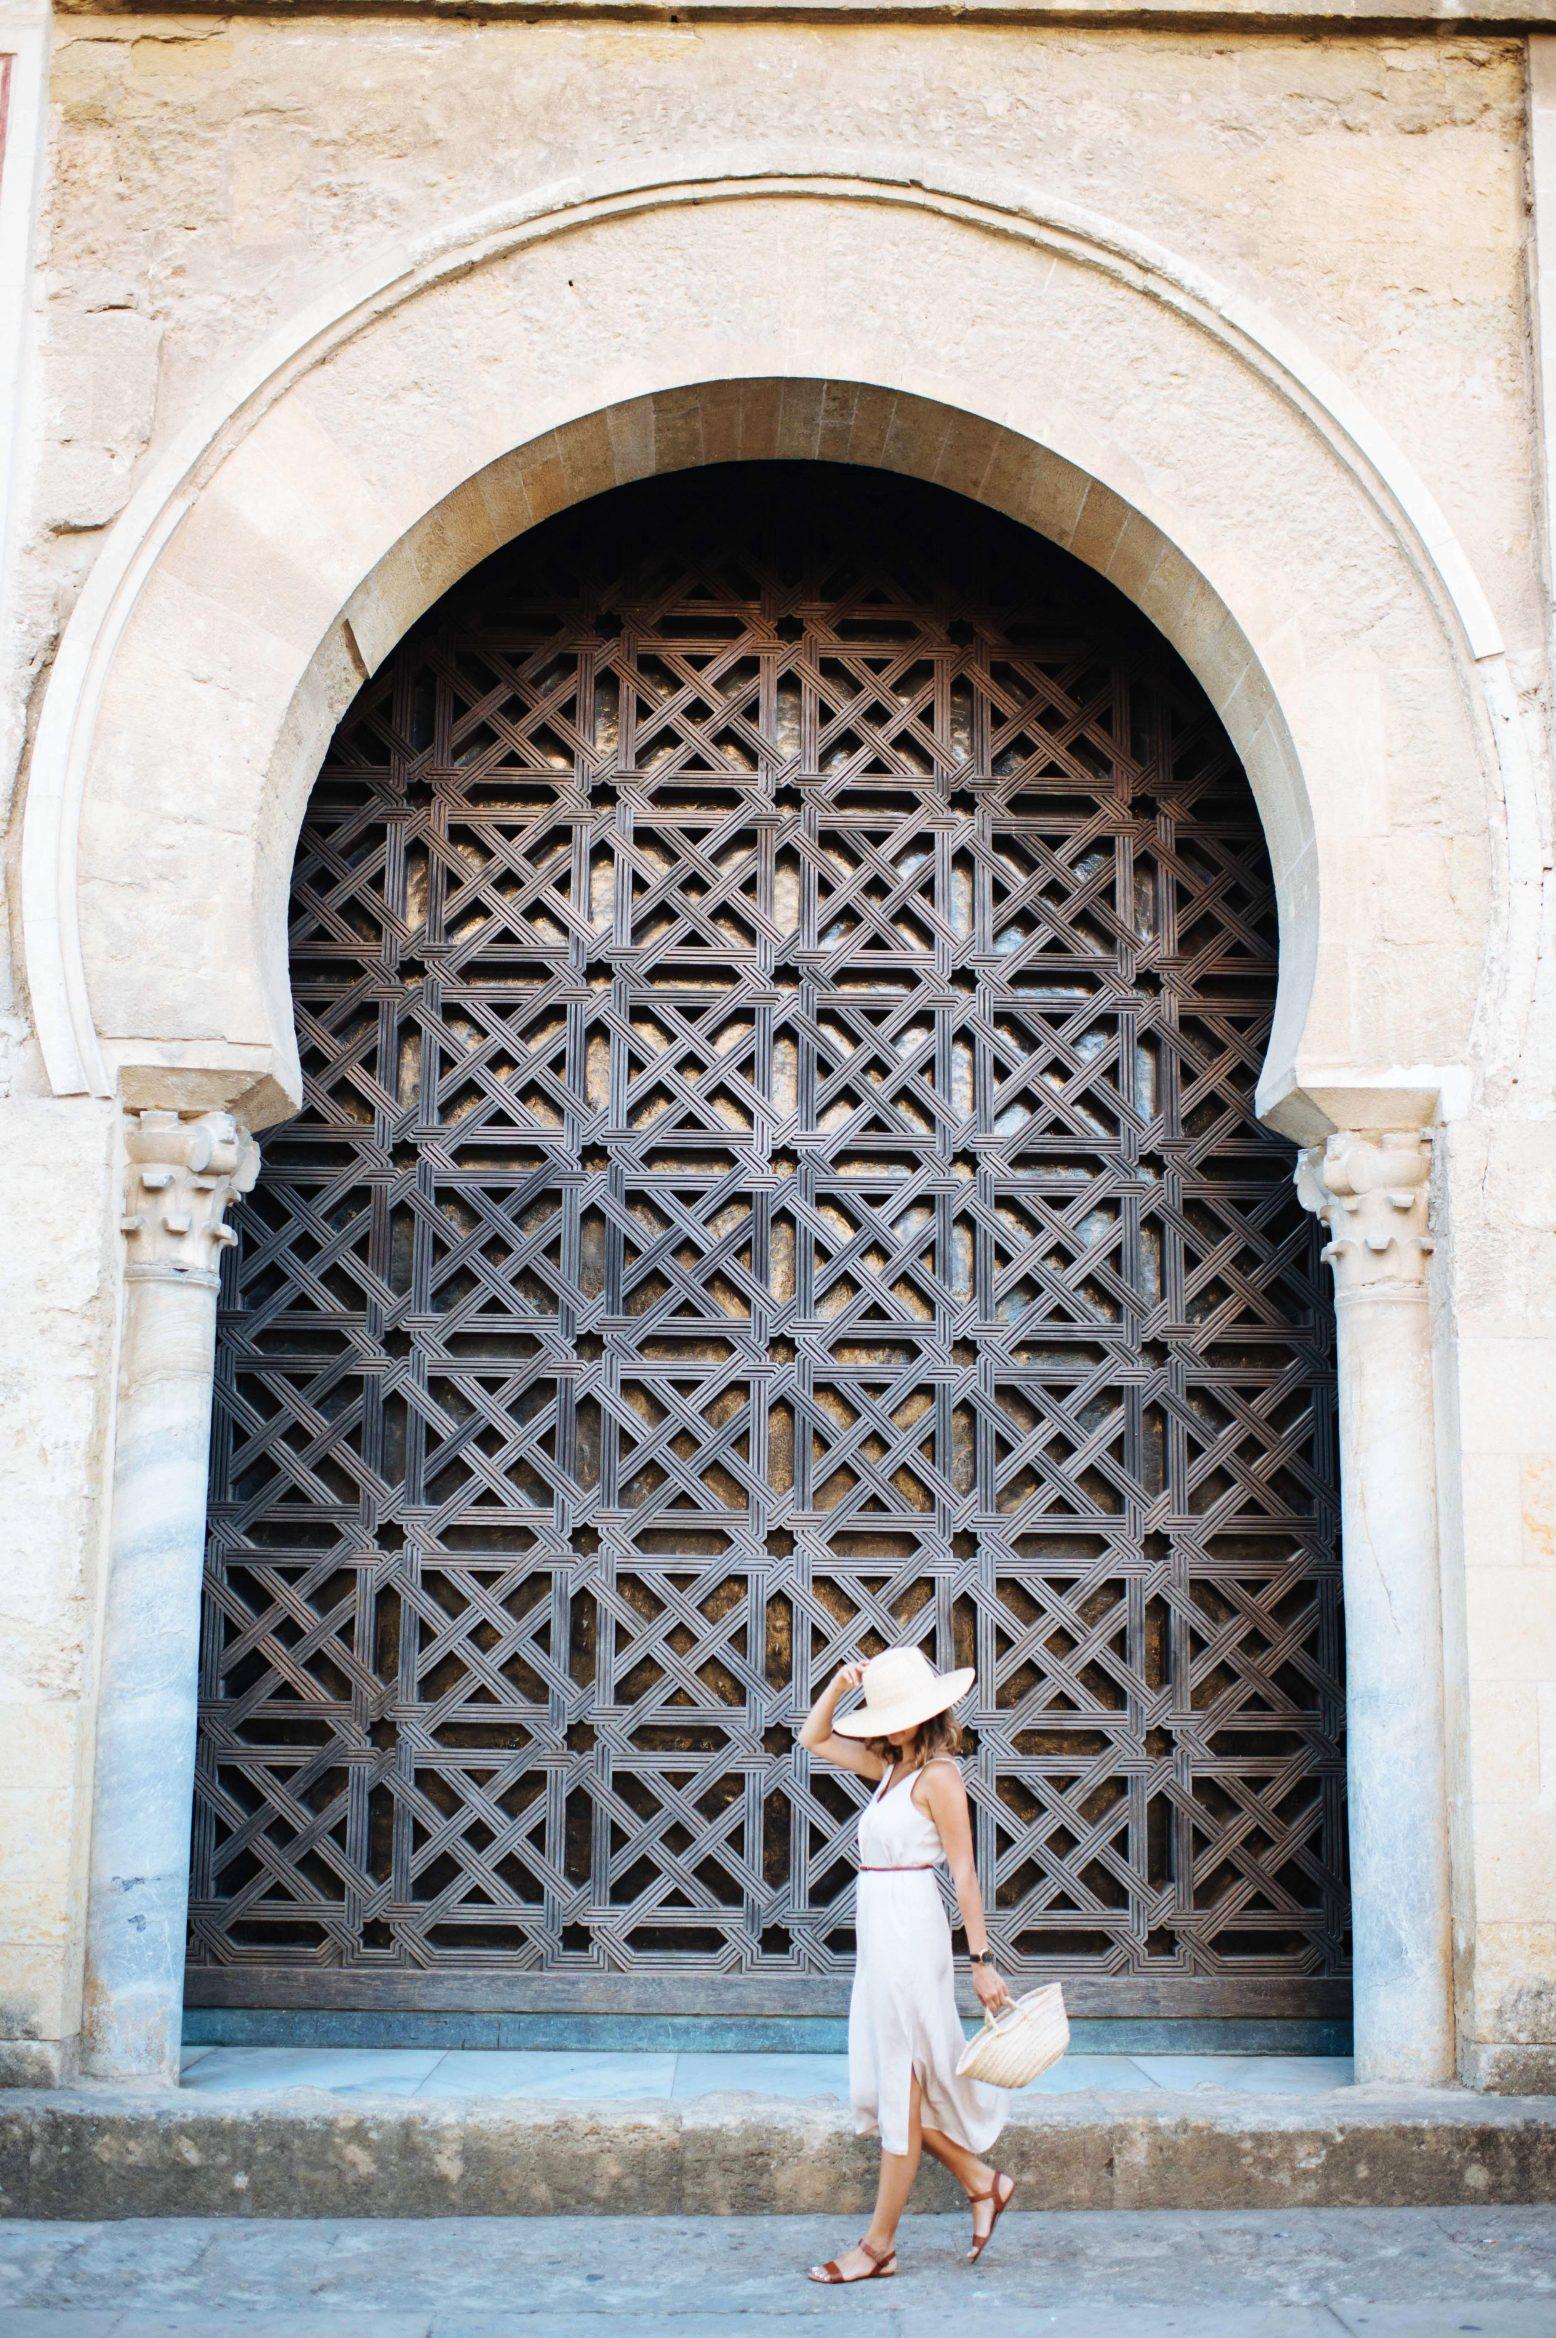 Cordoba-Mezquita-778x1169@2x